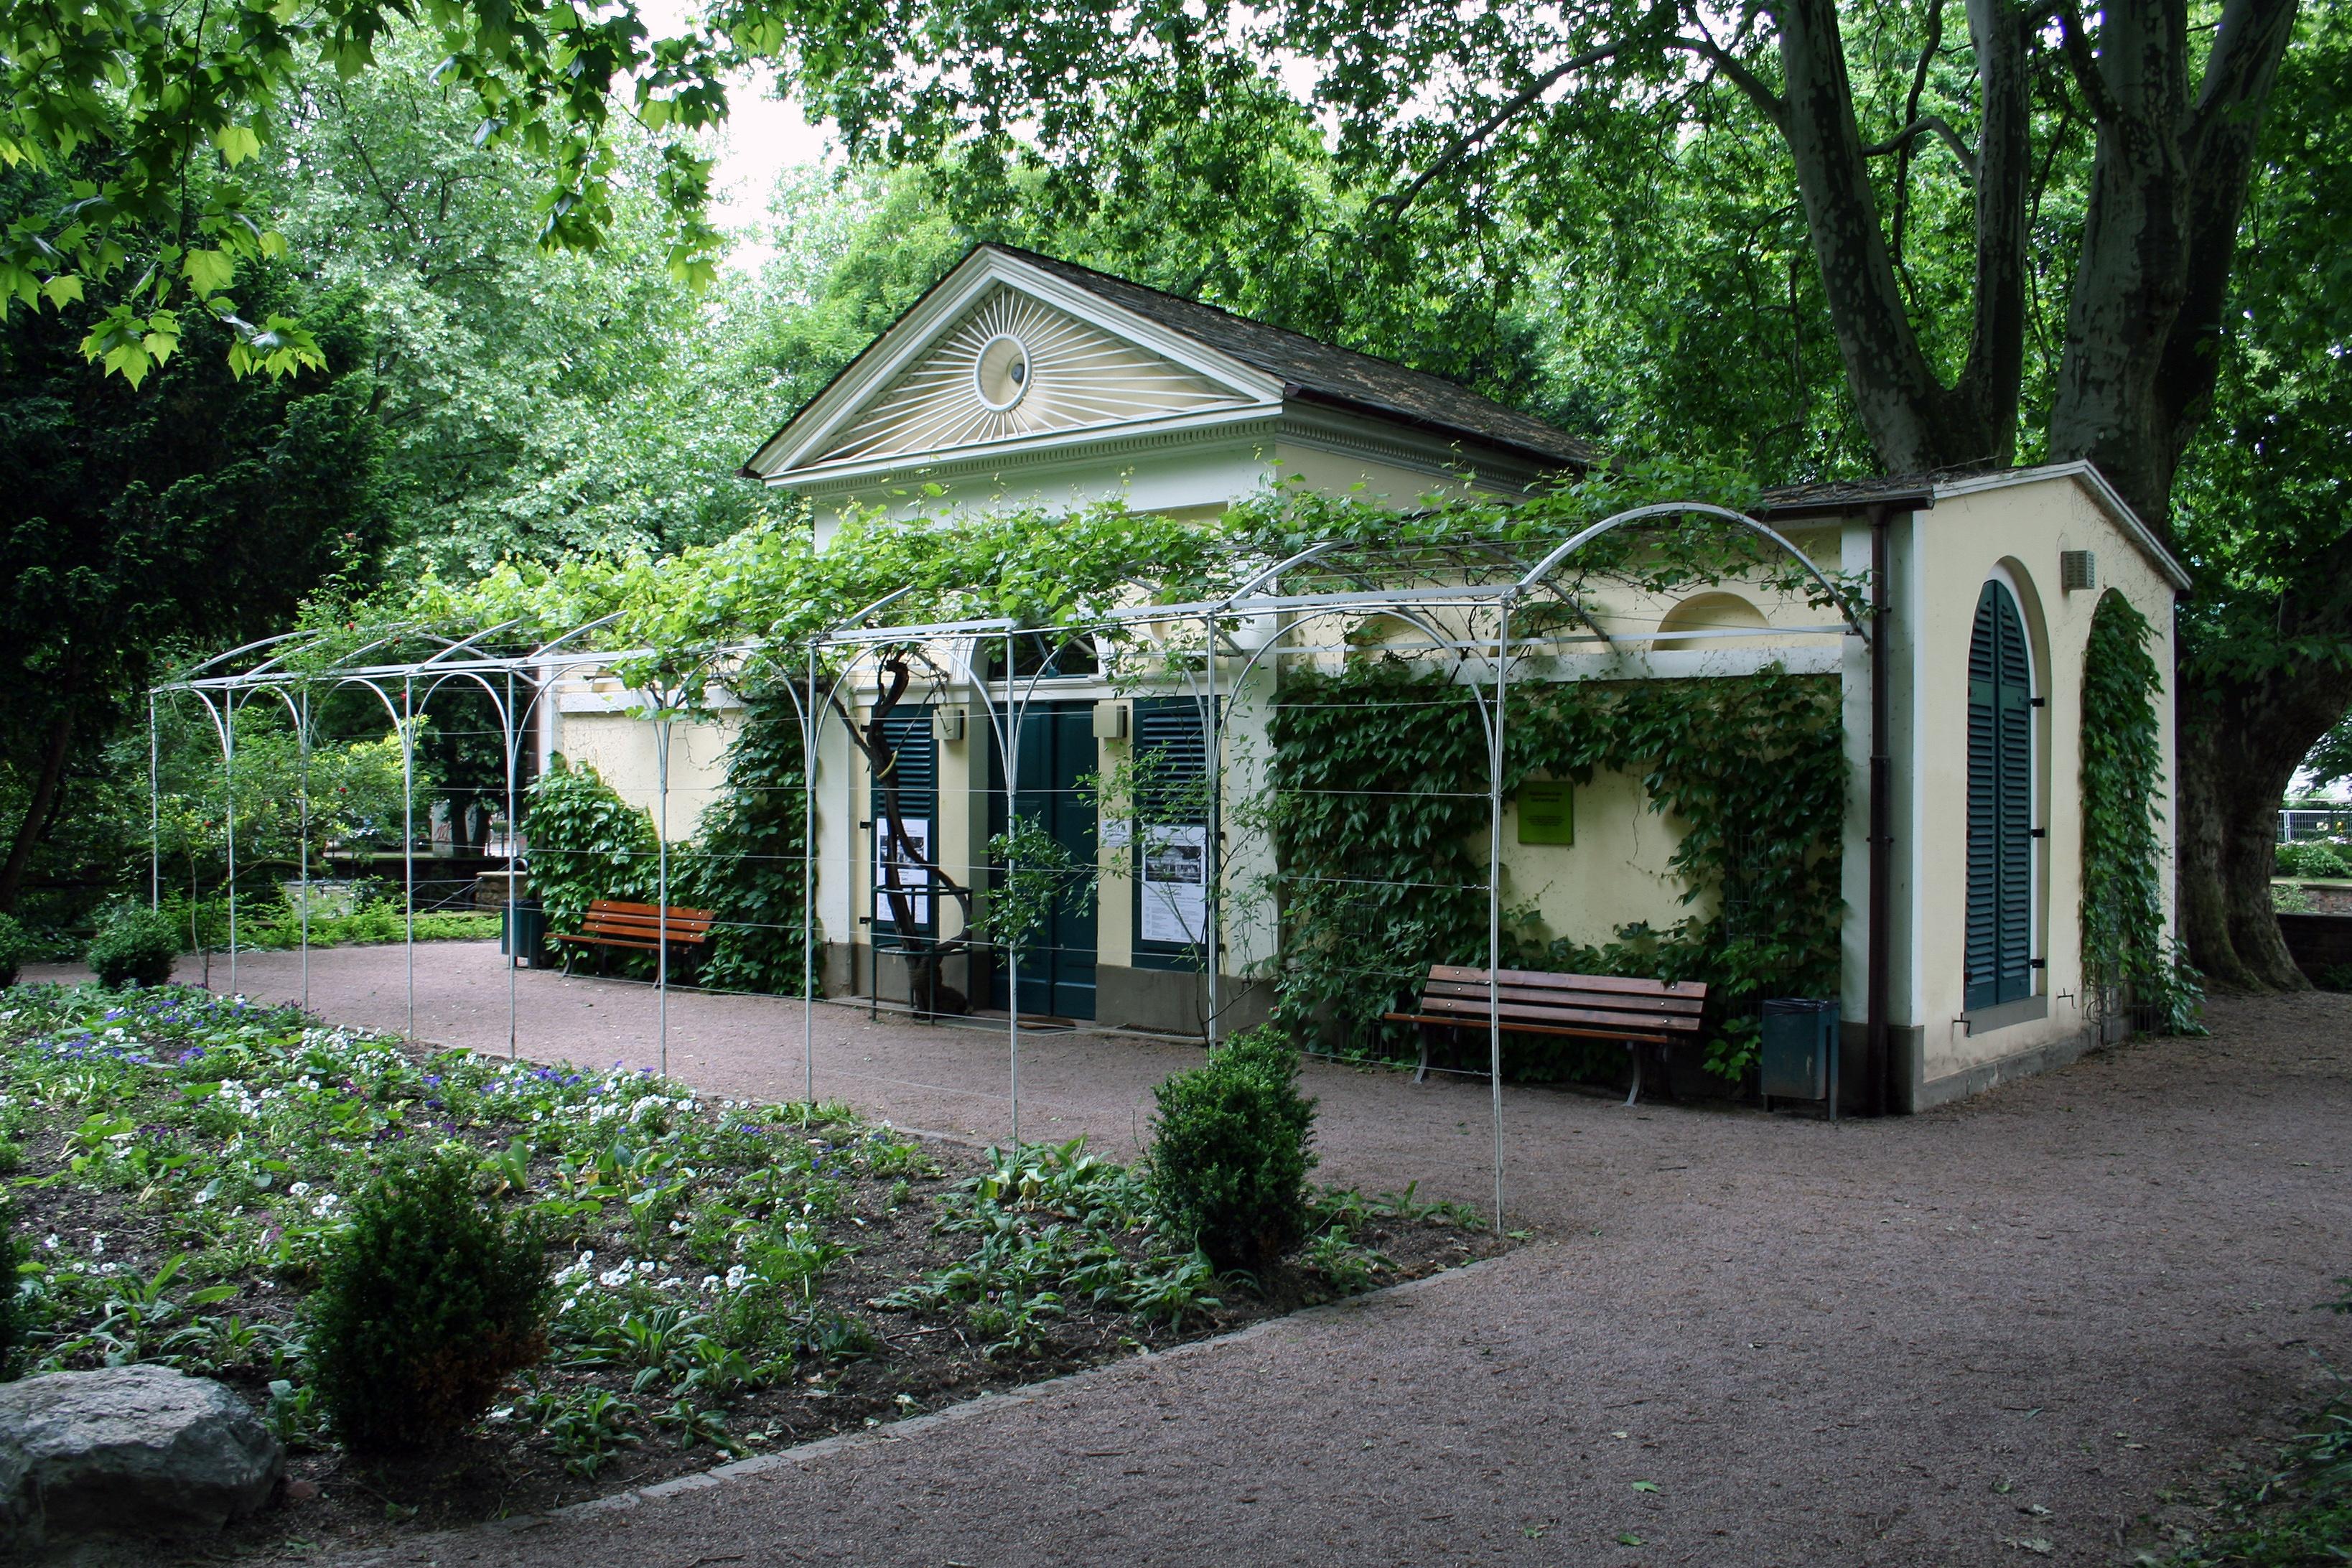 Nebbiensches gartenhaus wikiwand - Gartenhaus romantisch ...